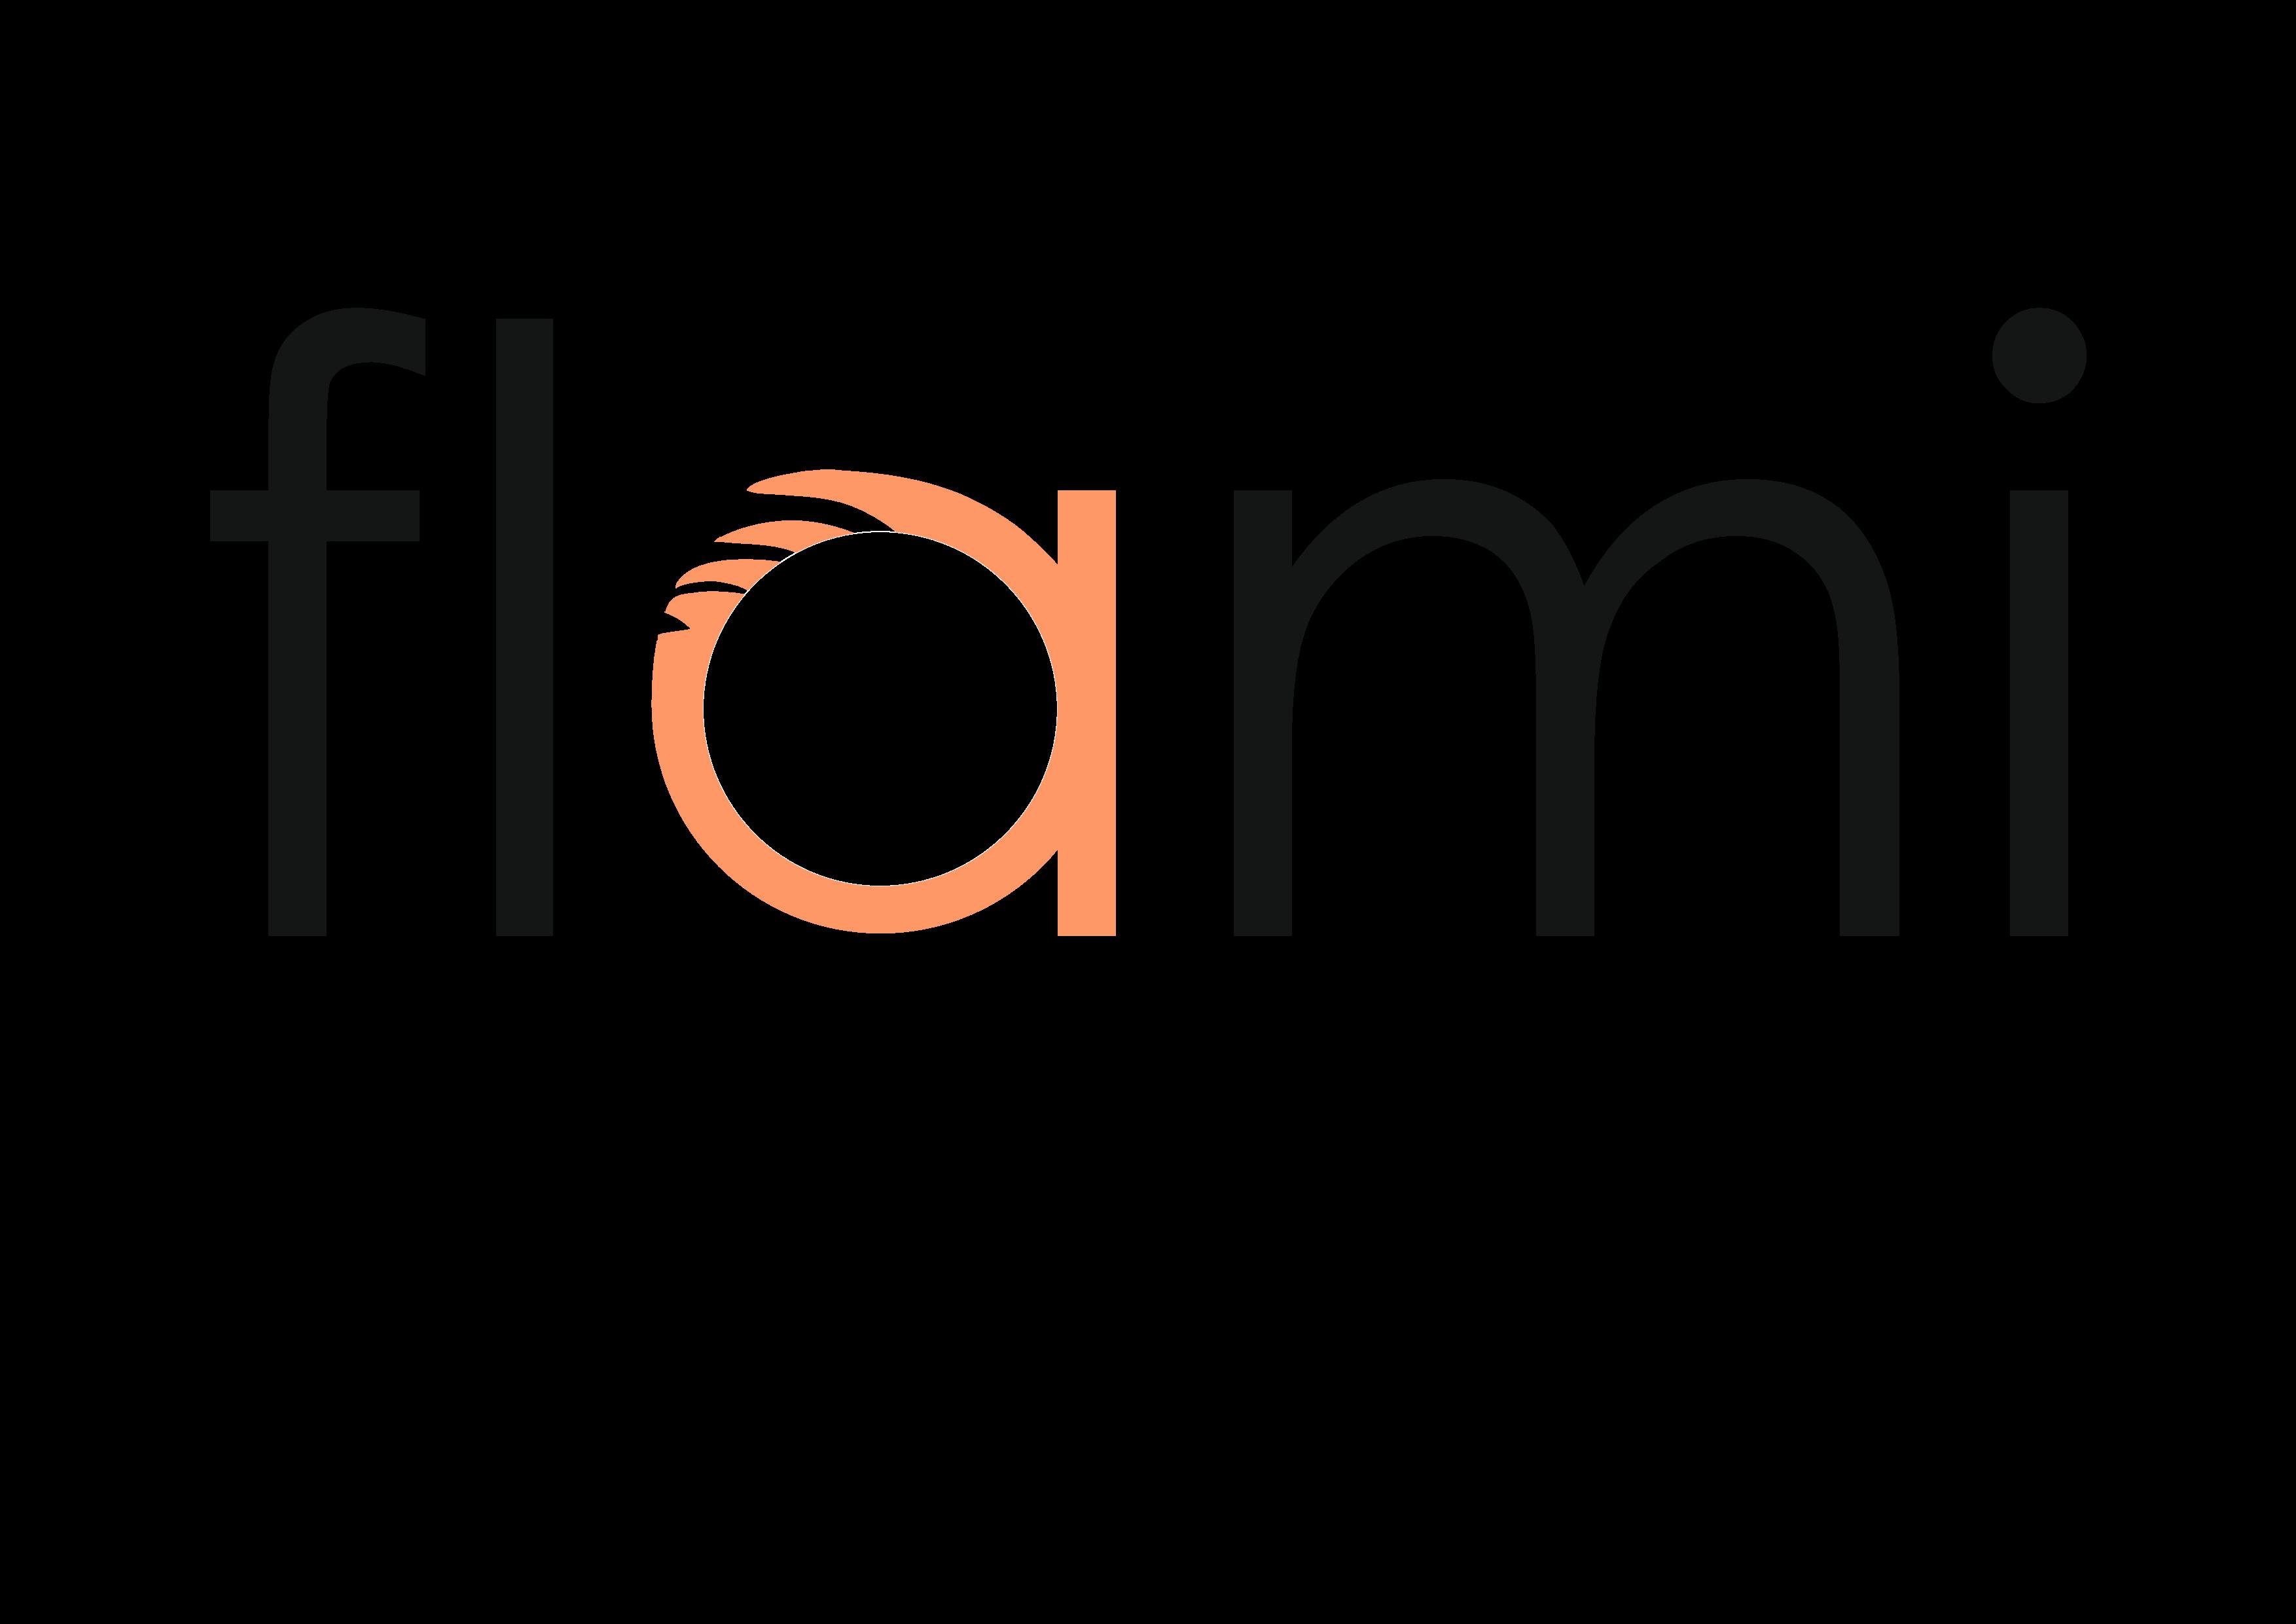 flami-logo